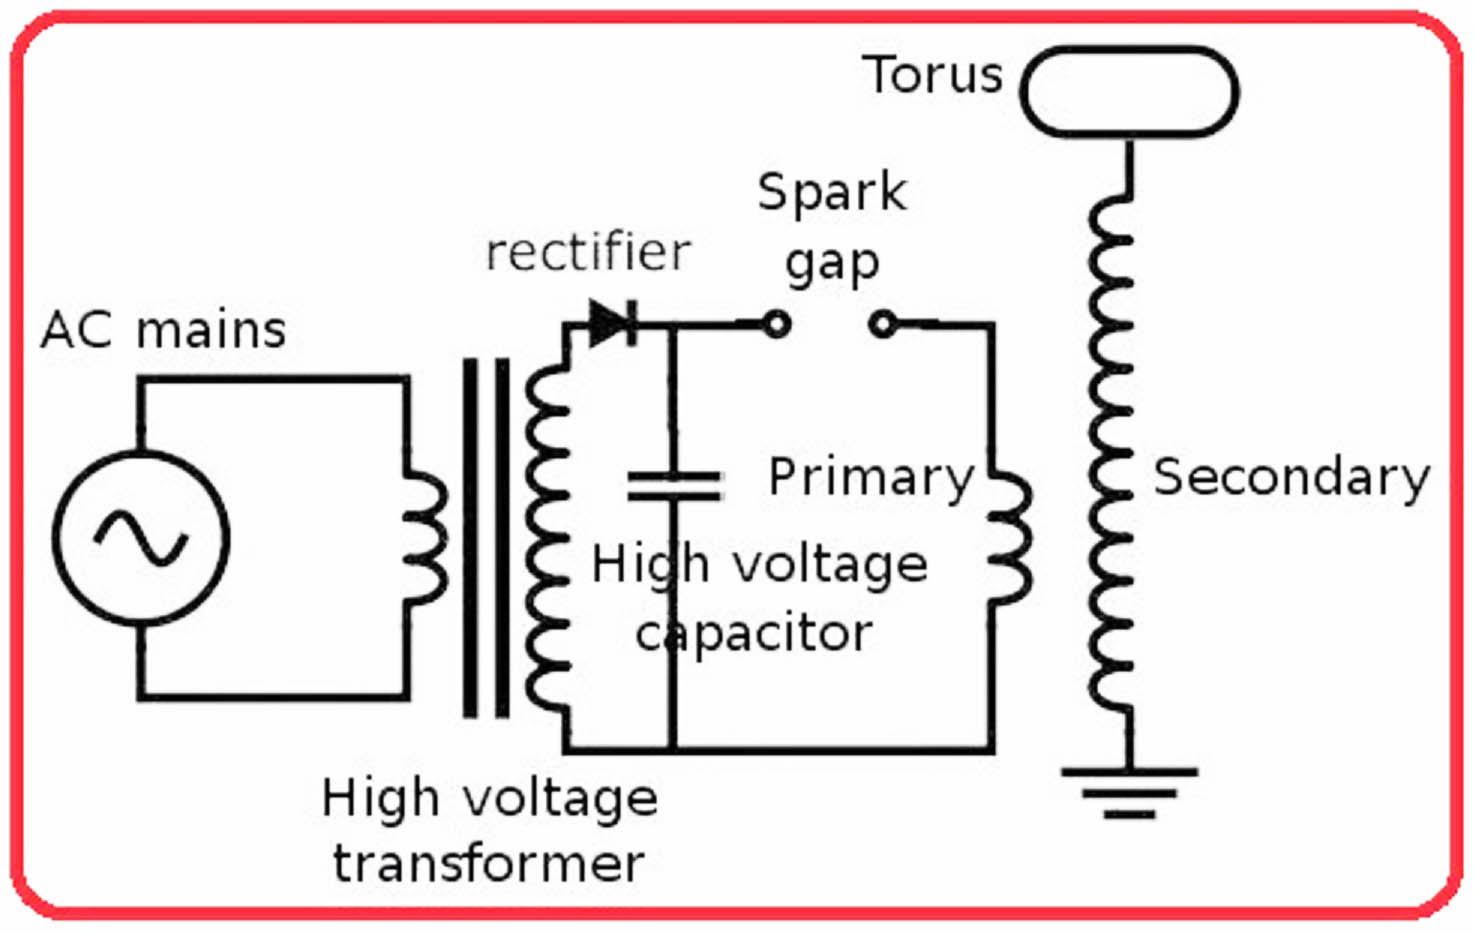 medium resolution of 6 volt coil wiring diagram for tesla wiring library 6 volt coil wiring diagram